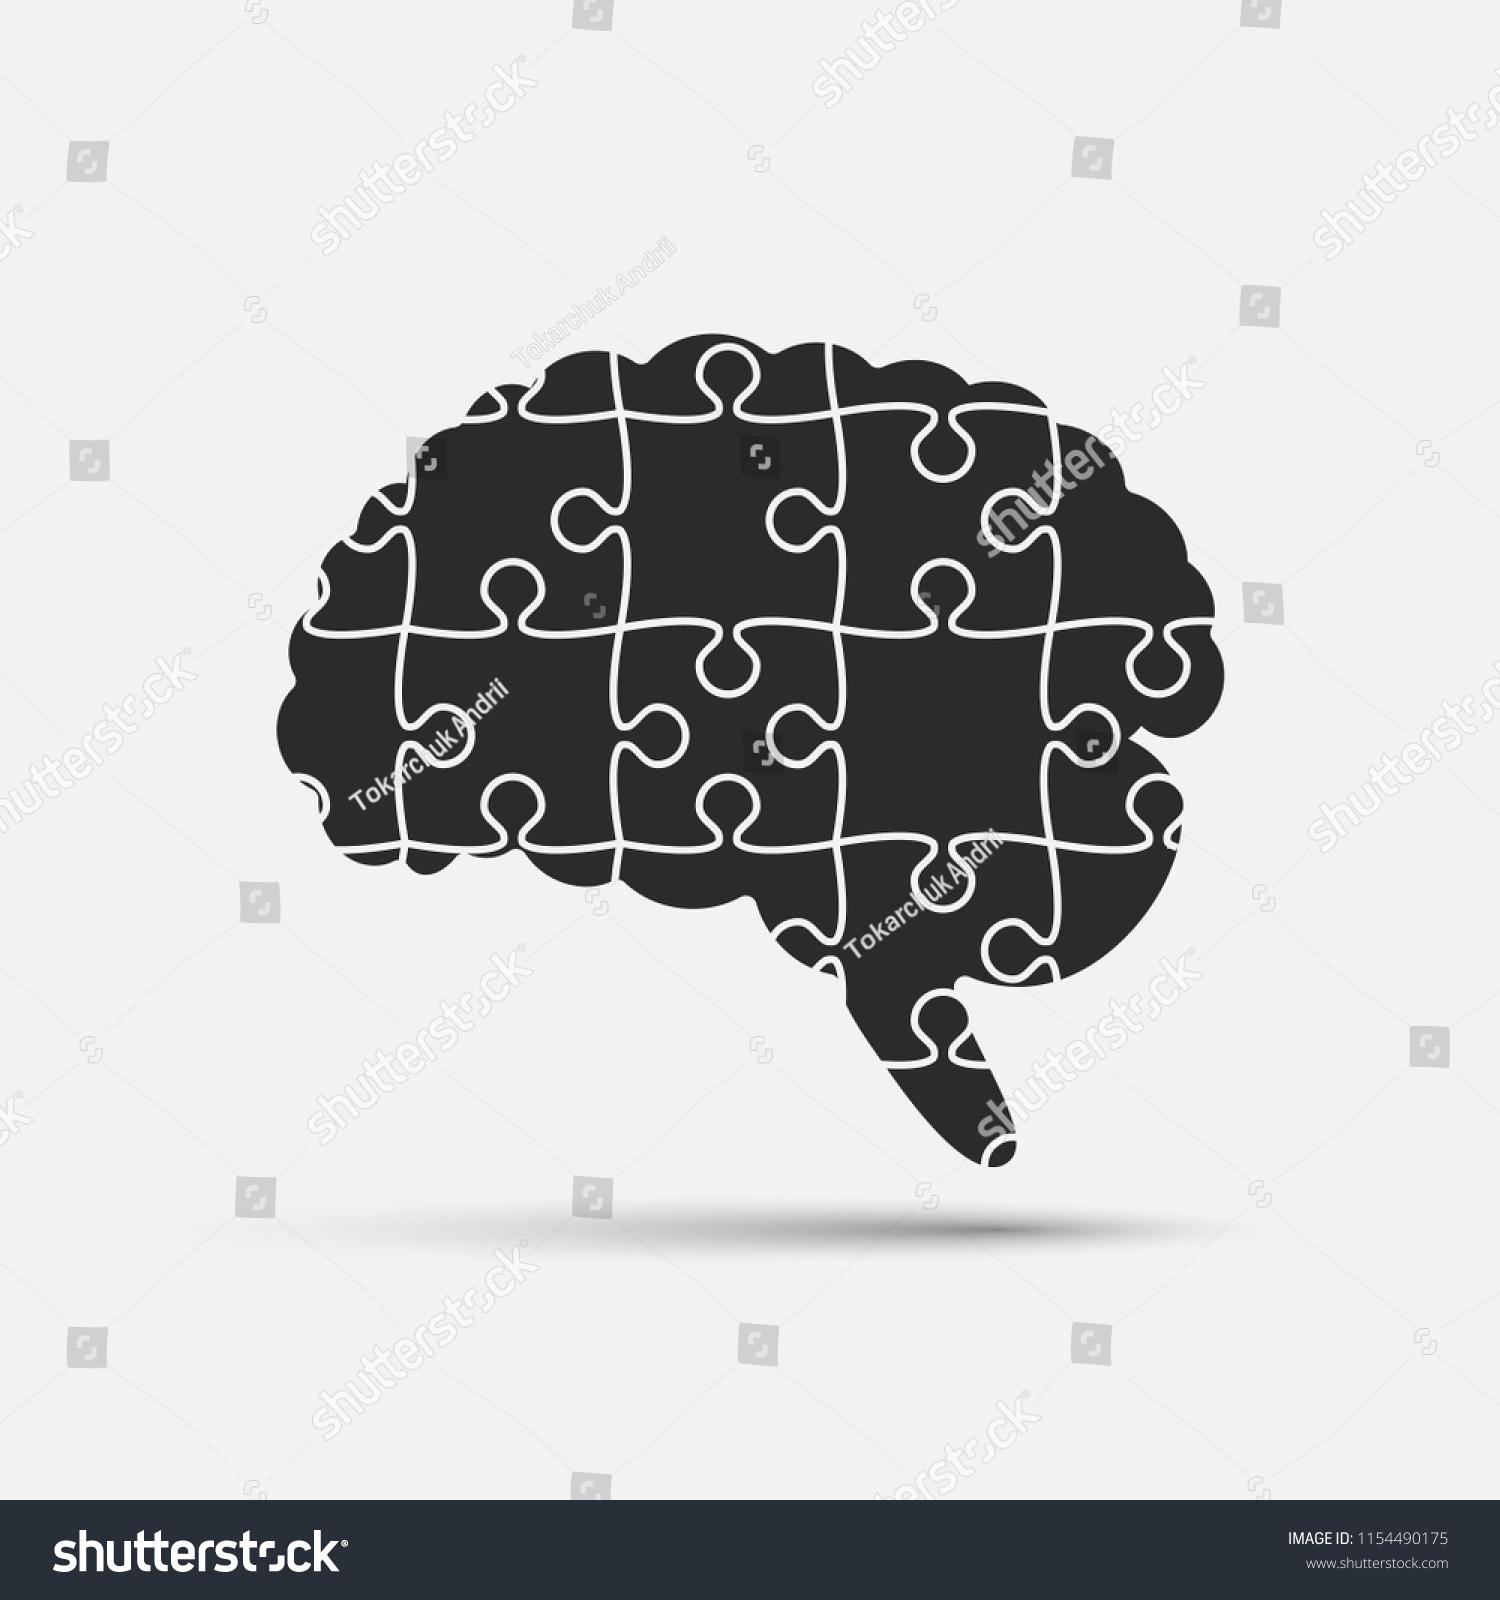 Puzzle Piece Silhouette Brain Vector Illustration Stock Vector ...